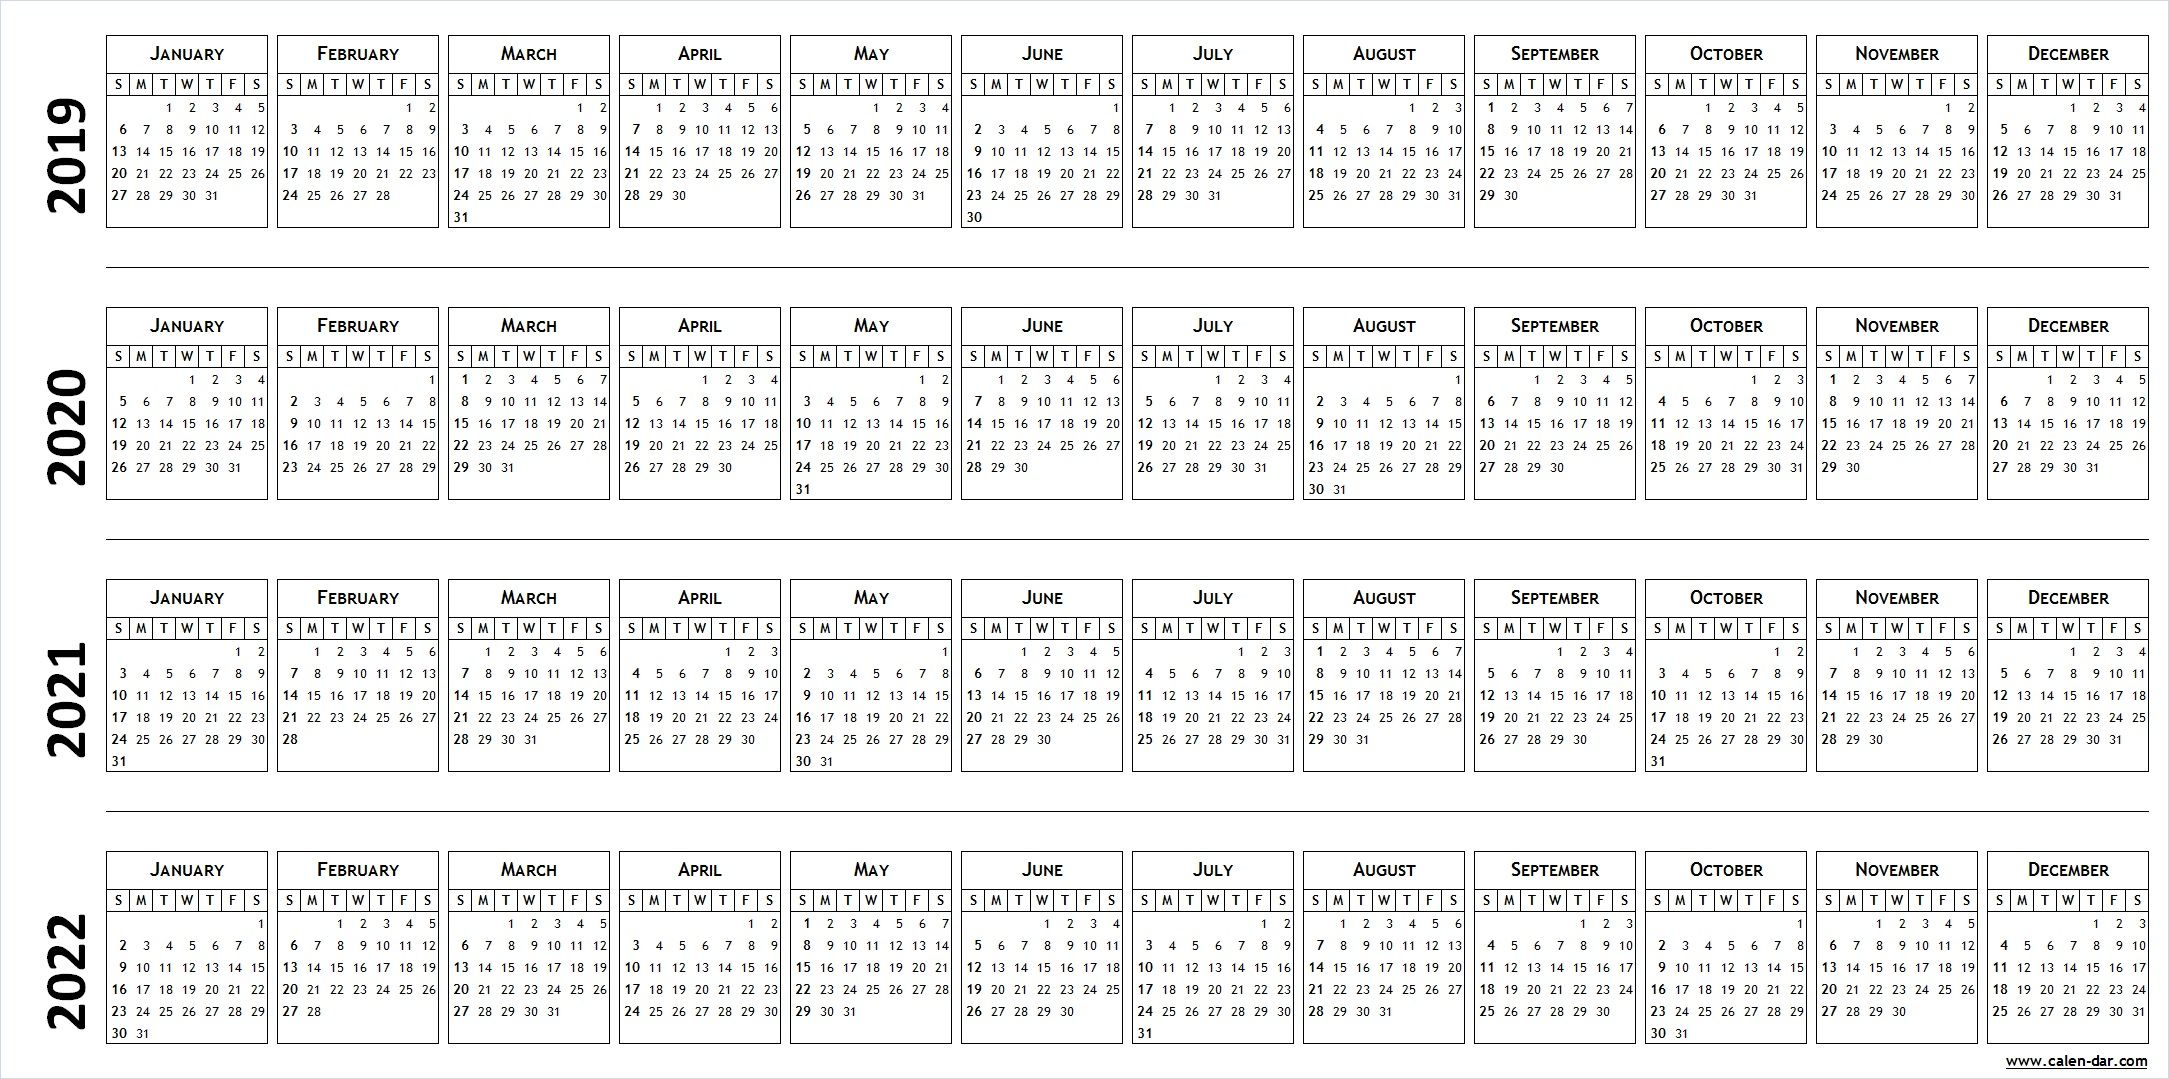 Blank Template For Calendar 2019 2020 2021 2022   Calendar   Blank for Blank Year Long Calendar 2022